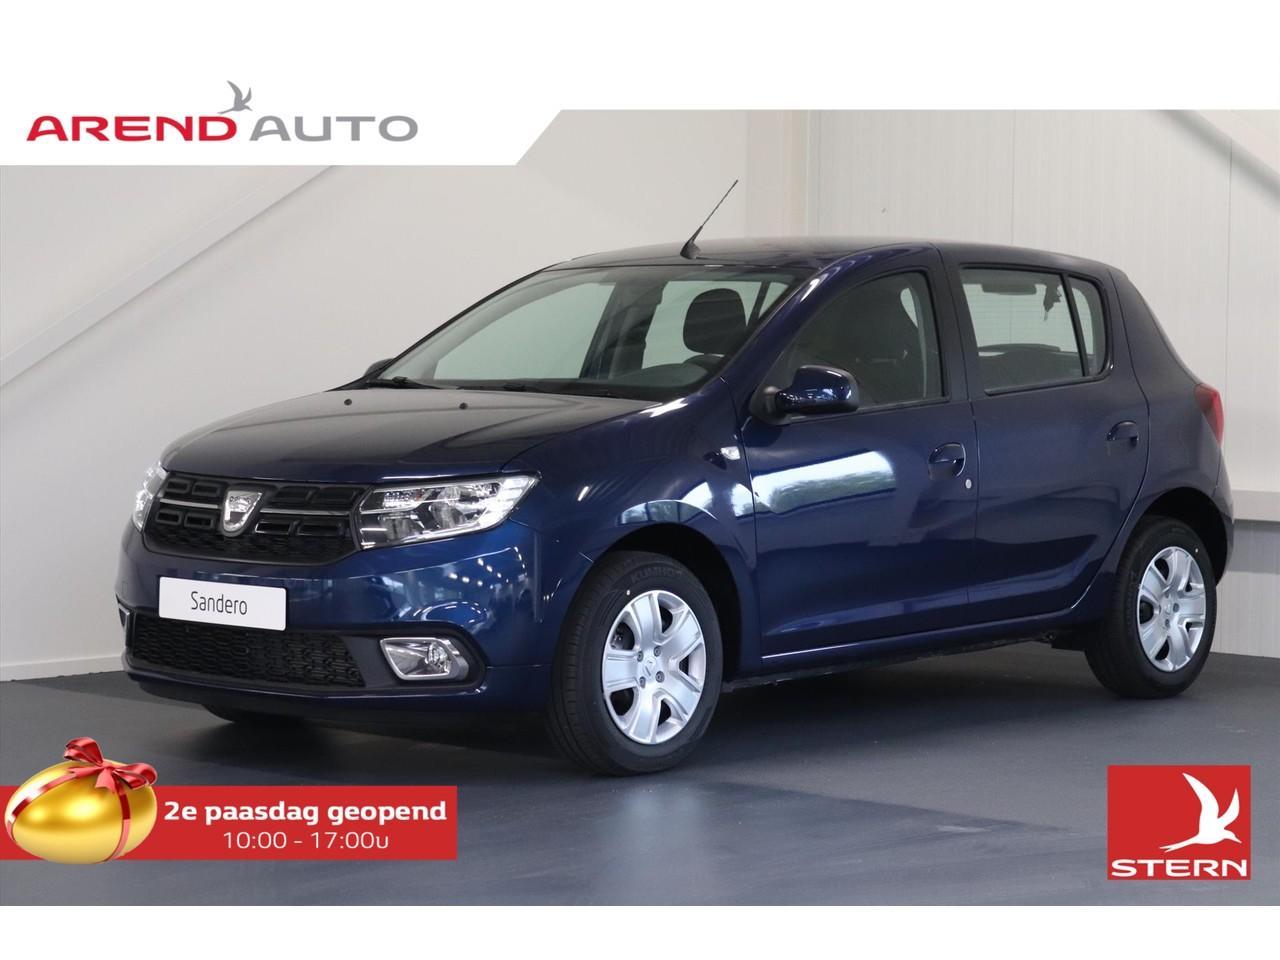 Dacia Sandero 0.9 tce 90pk s&s lauréate